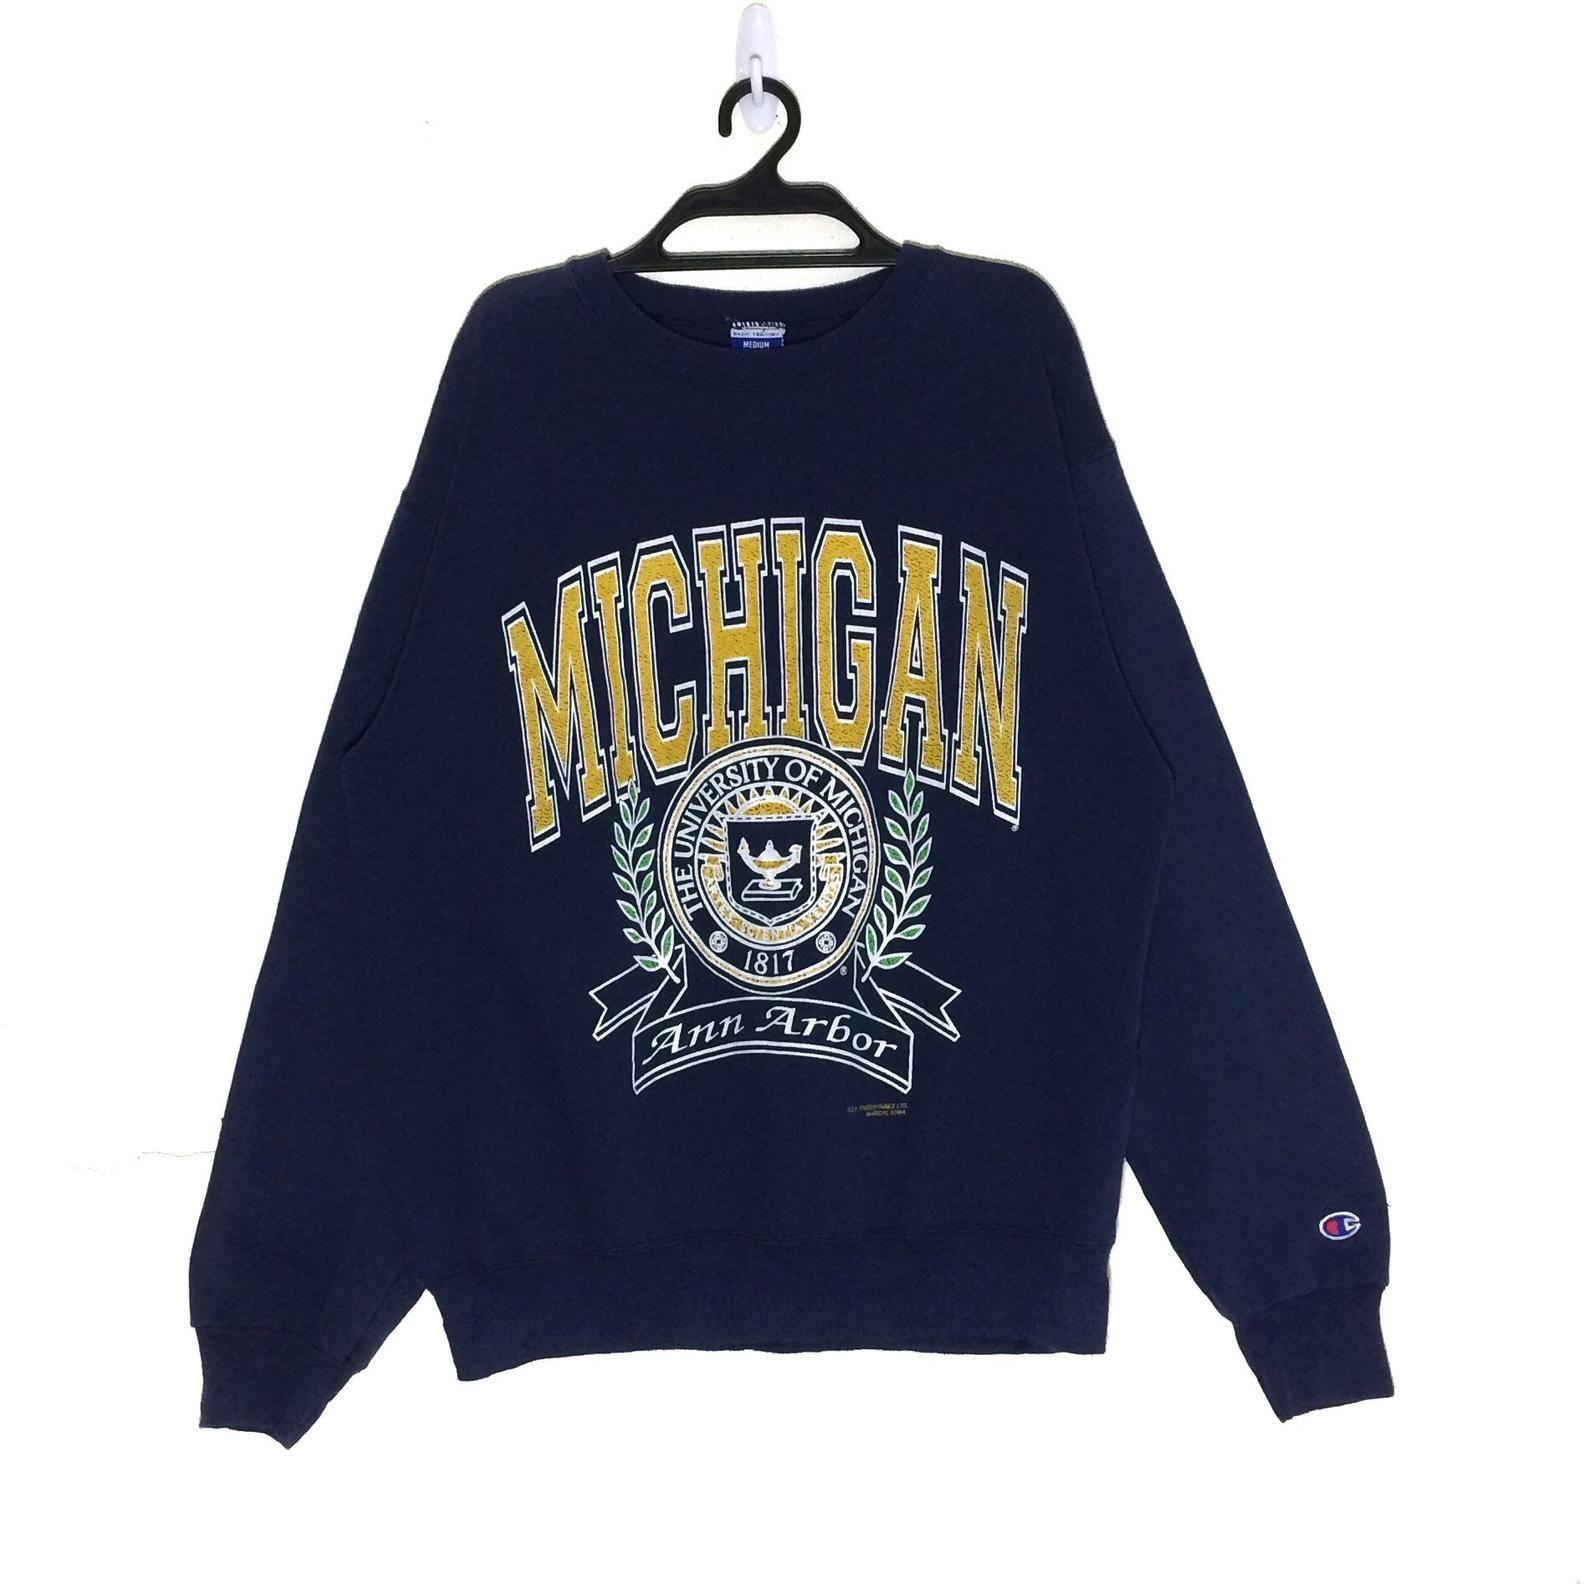 Rare Vintage The University Of Michigan X Champion Sweatshirt Crewneck Pullovers Jumper Jacket Usa Ann Arbor Sweatshirts Champion Sweatshirt Used Clothing [ 1590 x 1588 Pixel ]